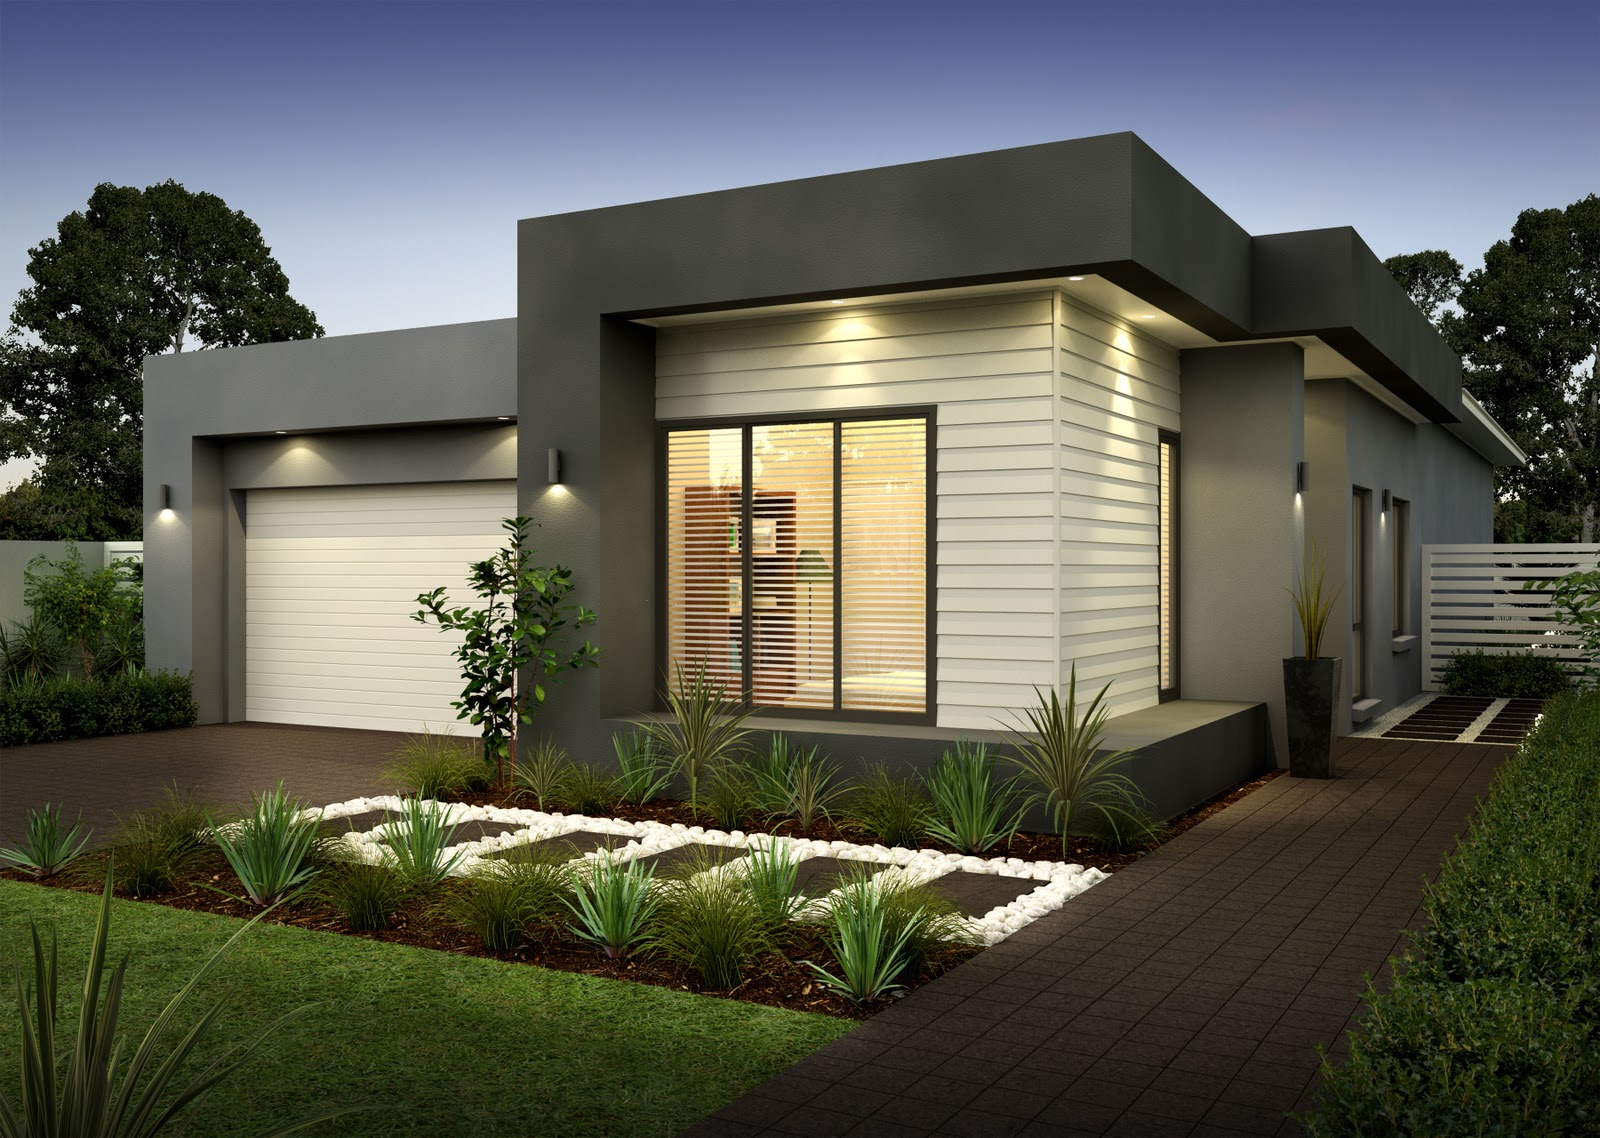 Floor Plans For Single Story Homes Adenbrook Homes September 2011